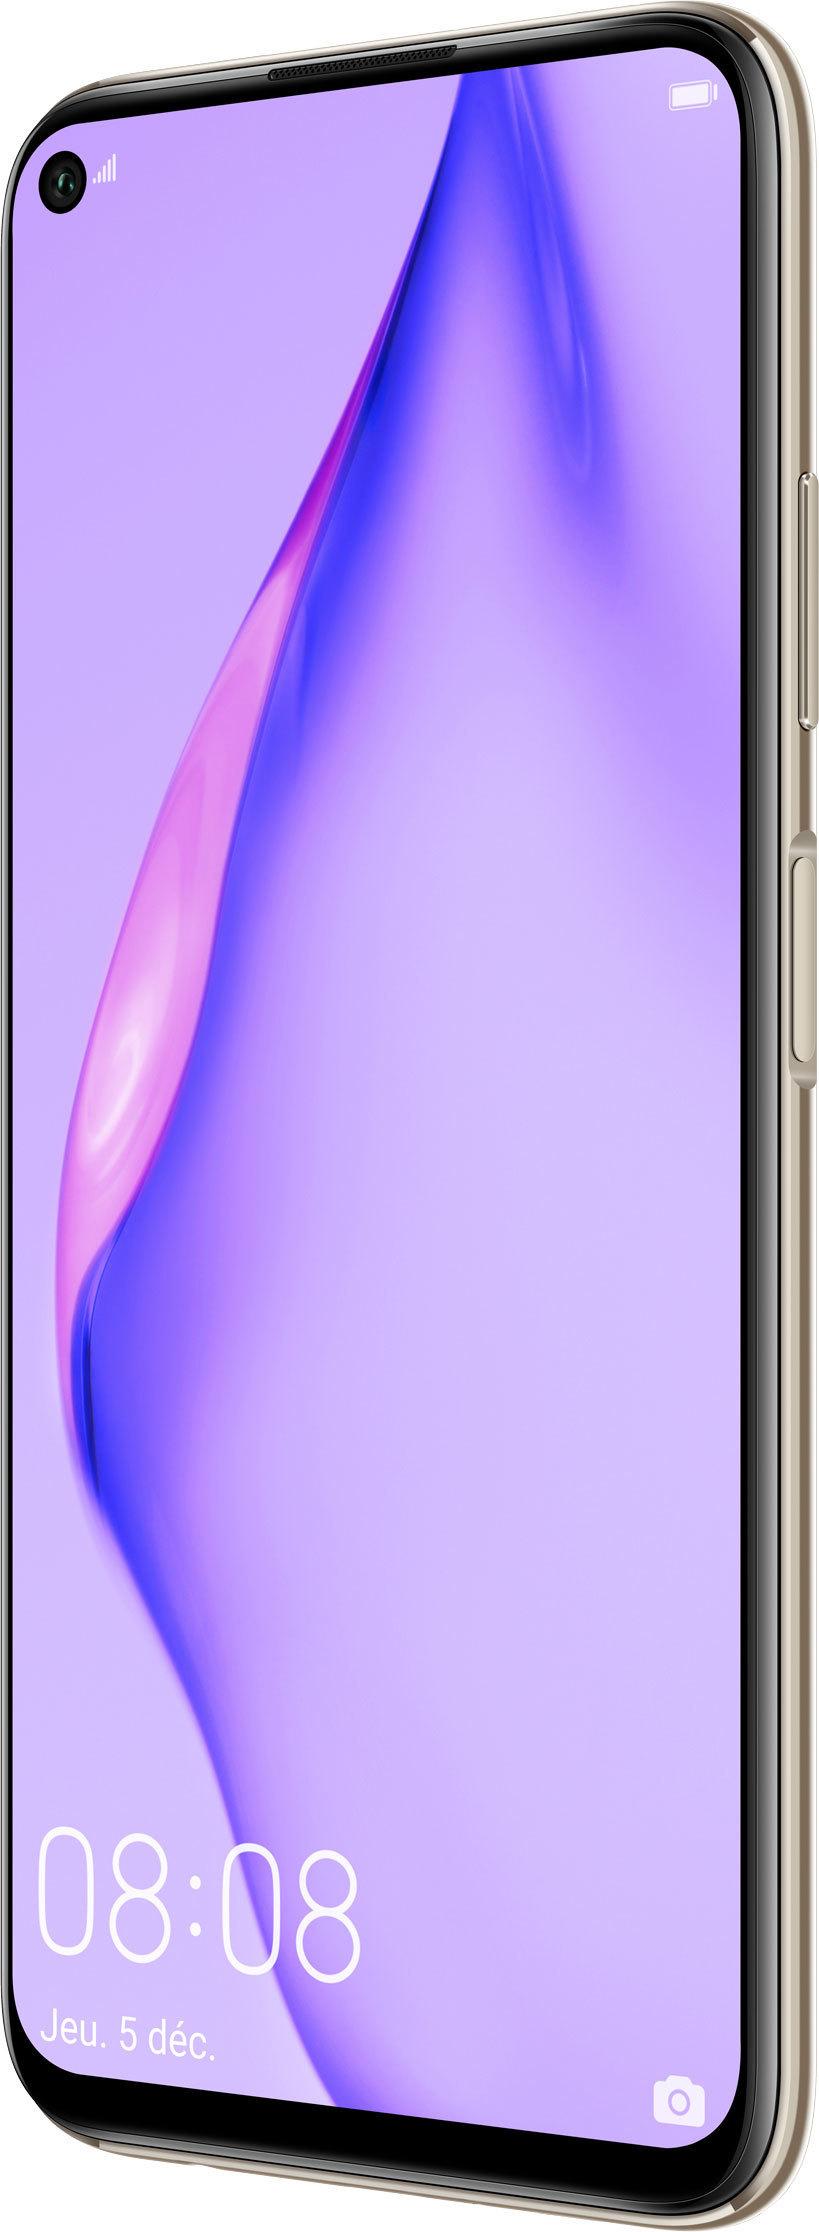 Smartphone P40 Lite 128 Go Huawei Rose